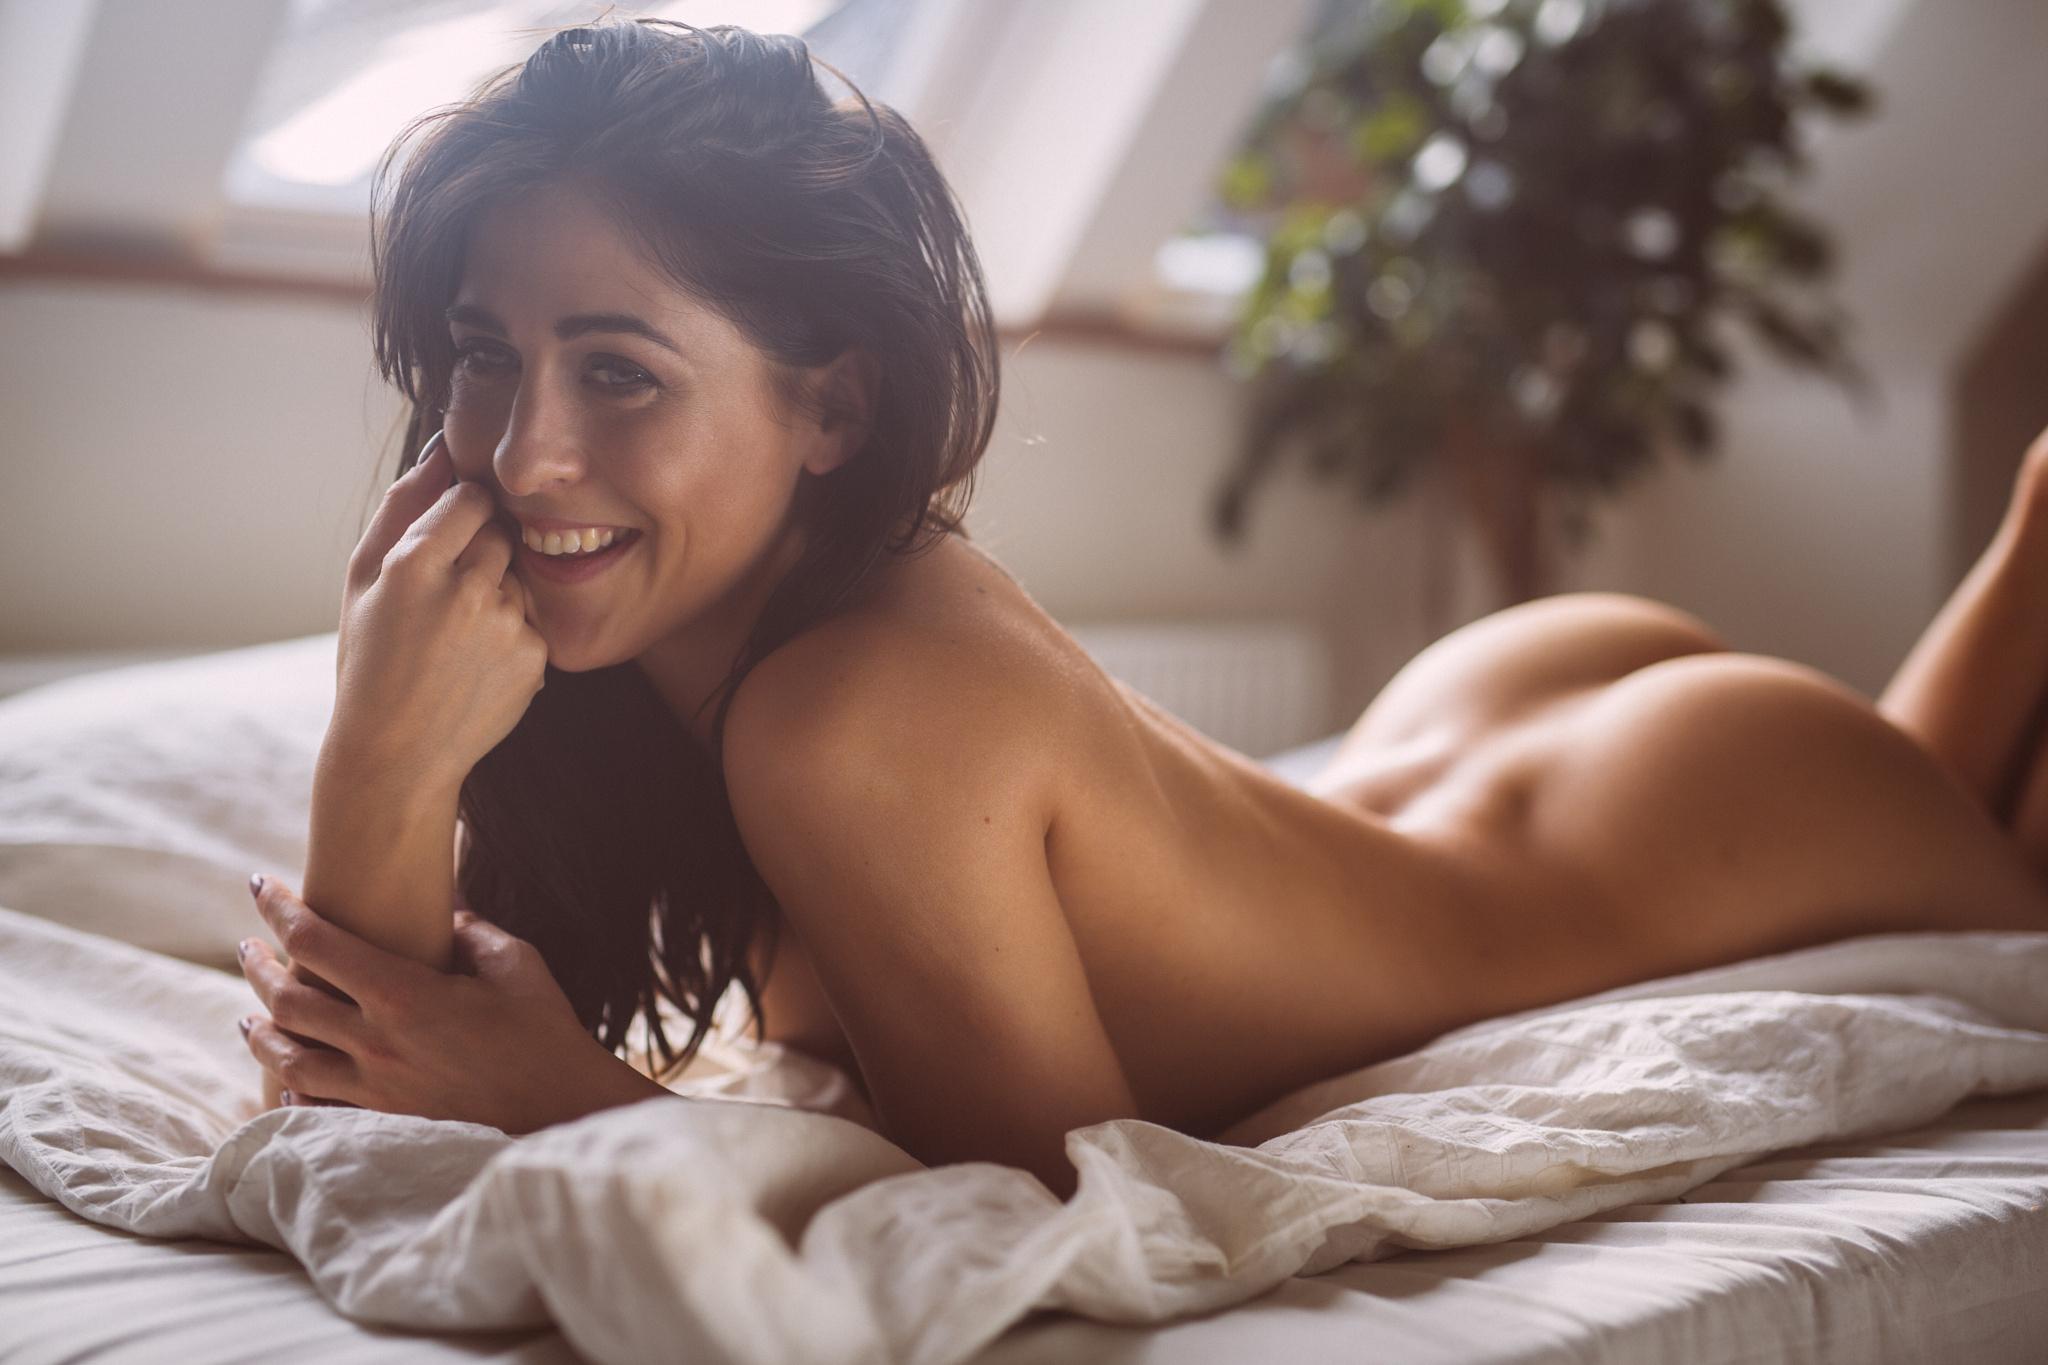 Smiling naked girls — img 12